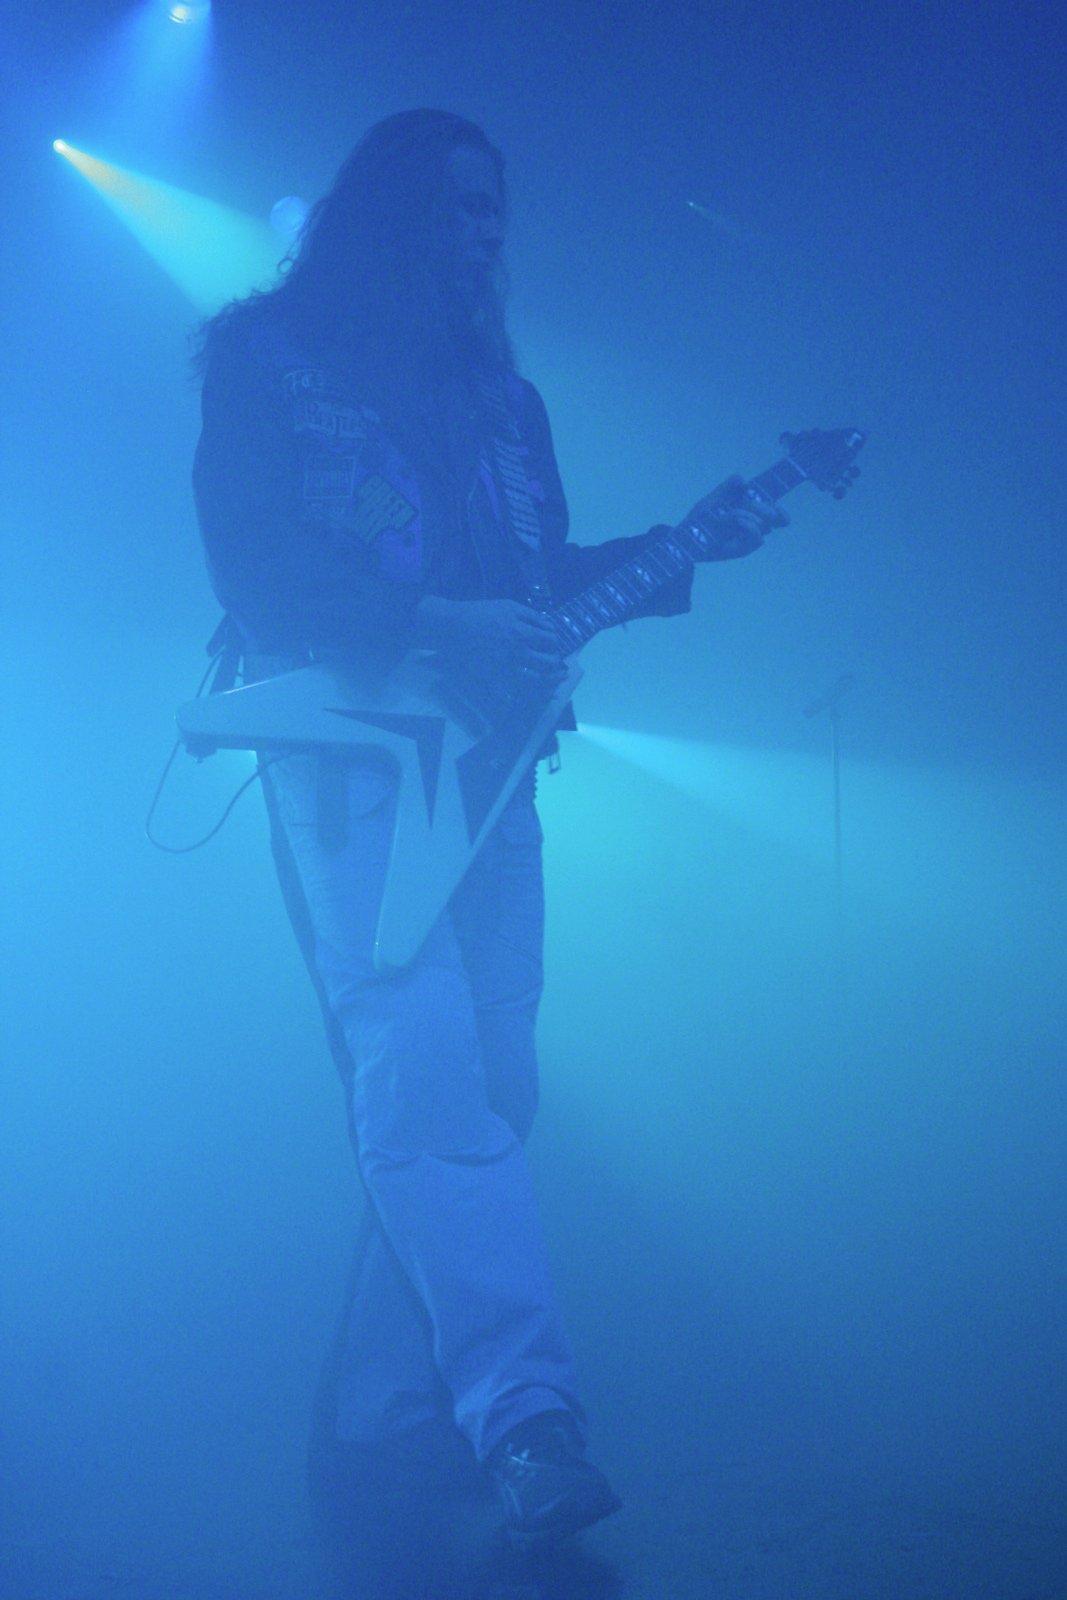 J.B.O. - Illingen - 27.11.2010 - 025